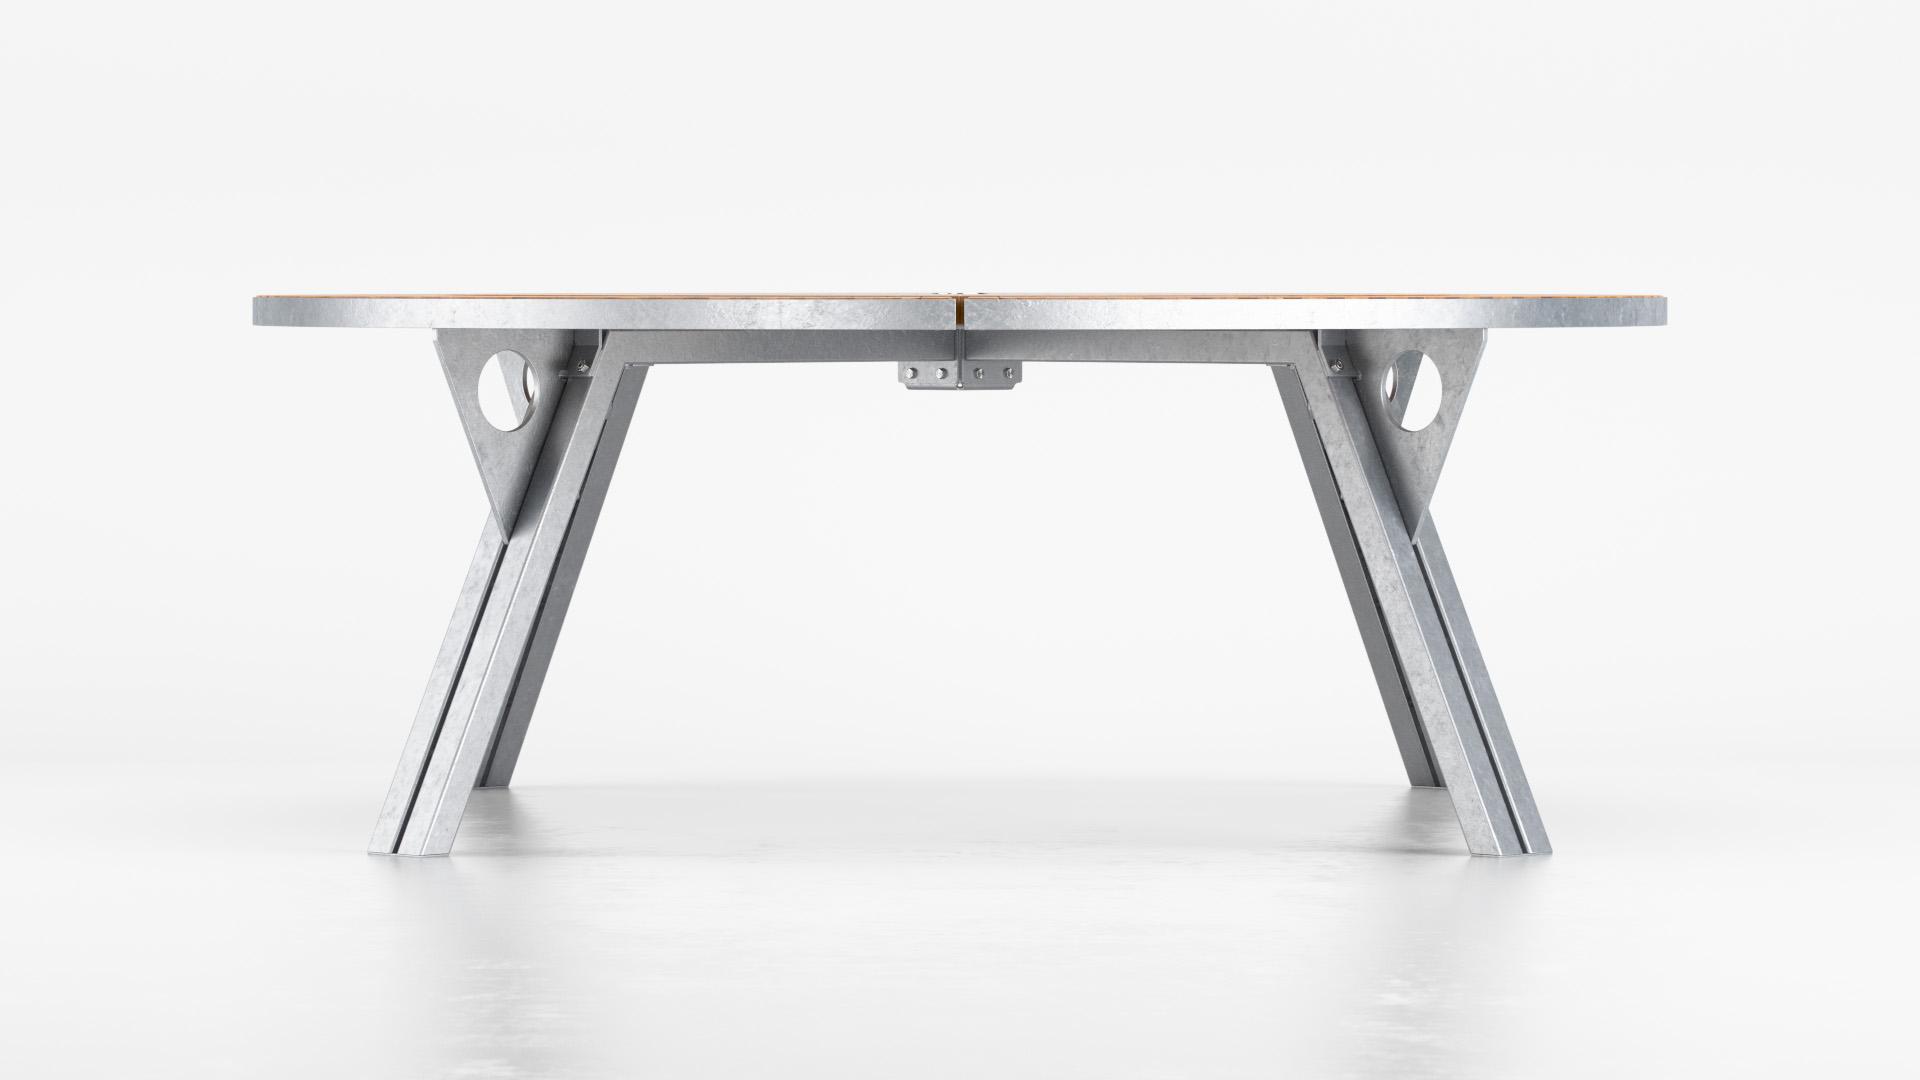 Gargantua_Table_Mode2_WhiteSet_01_0002